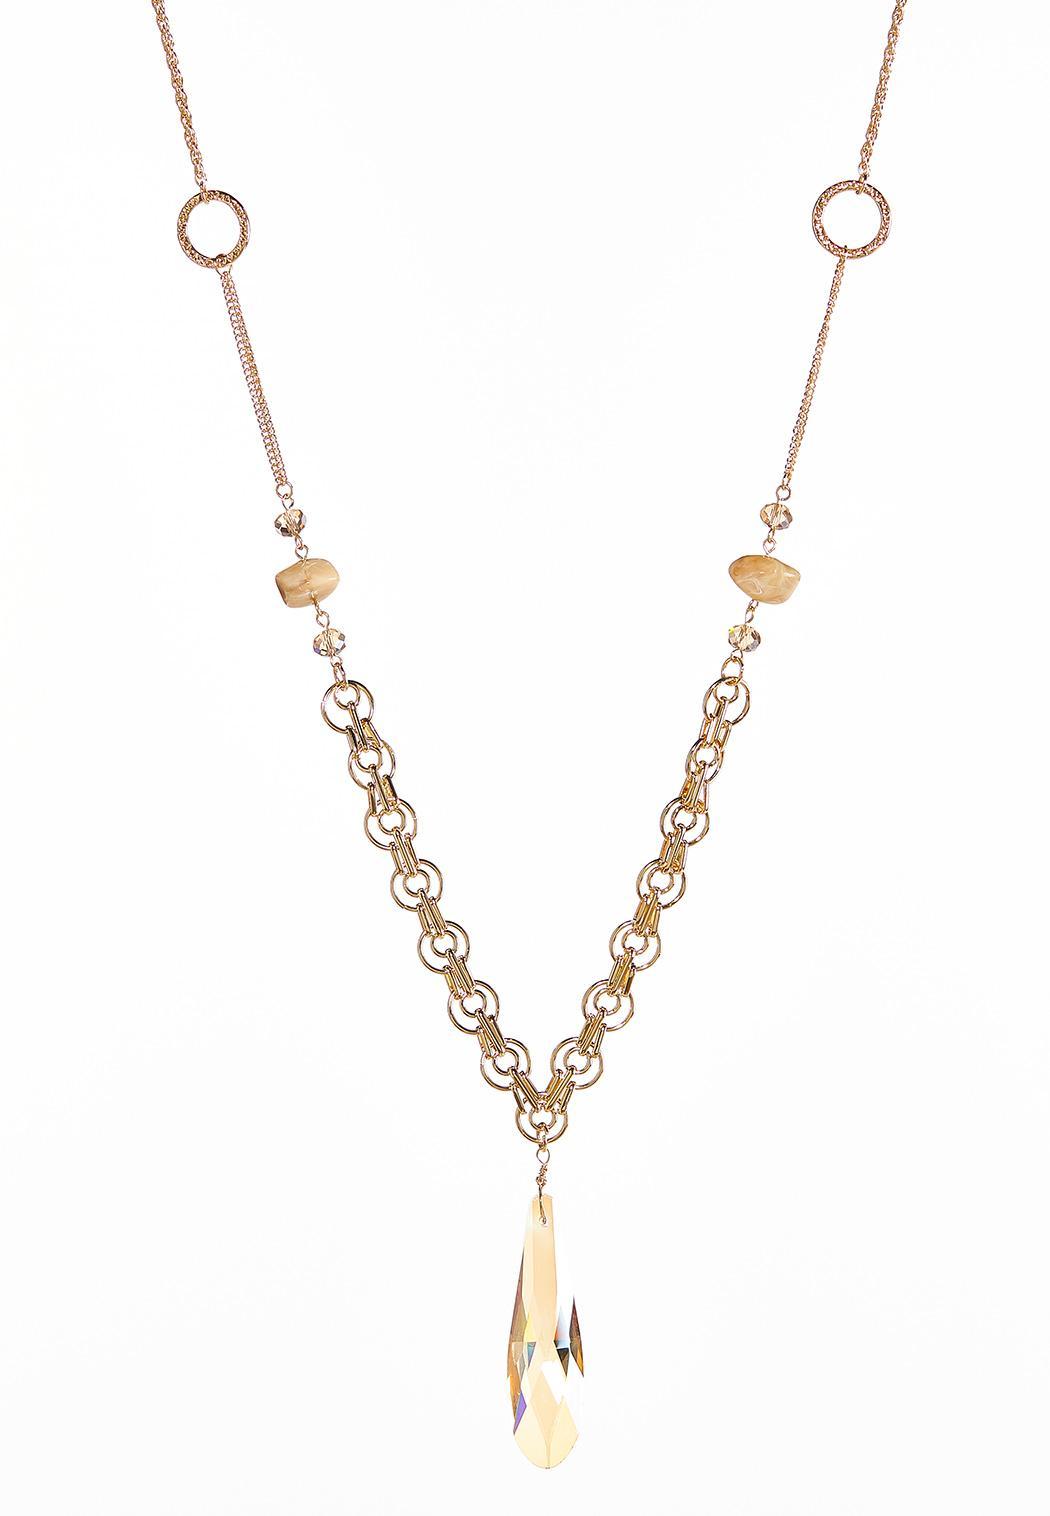 Glass Tear Shaped Pendant Necklace